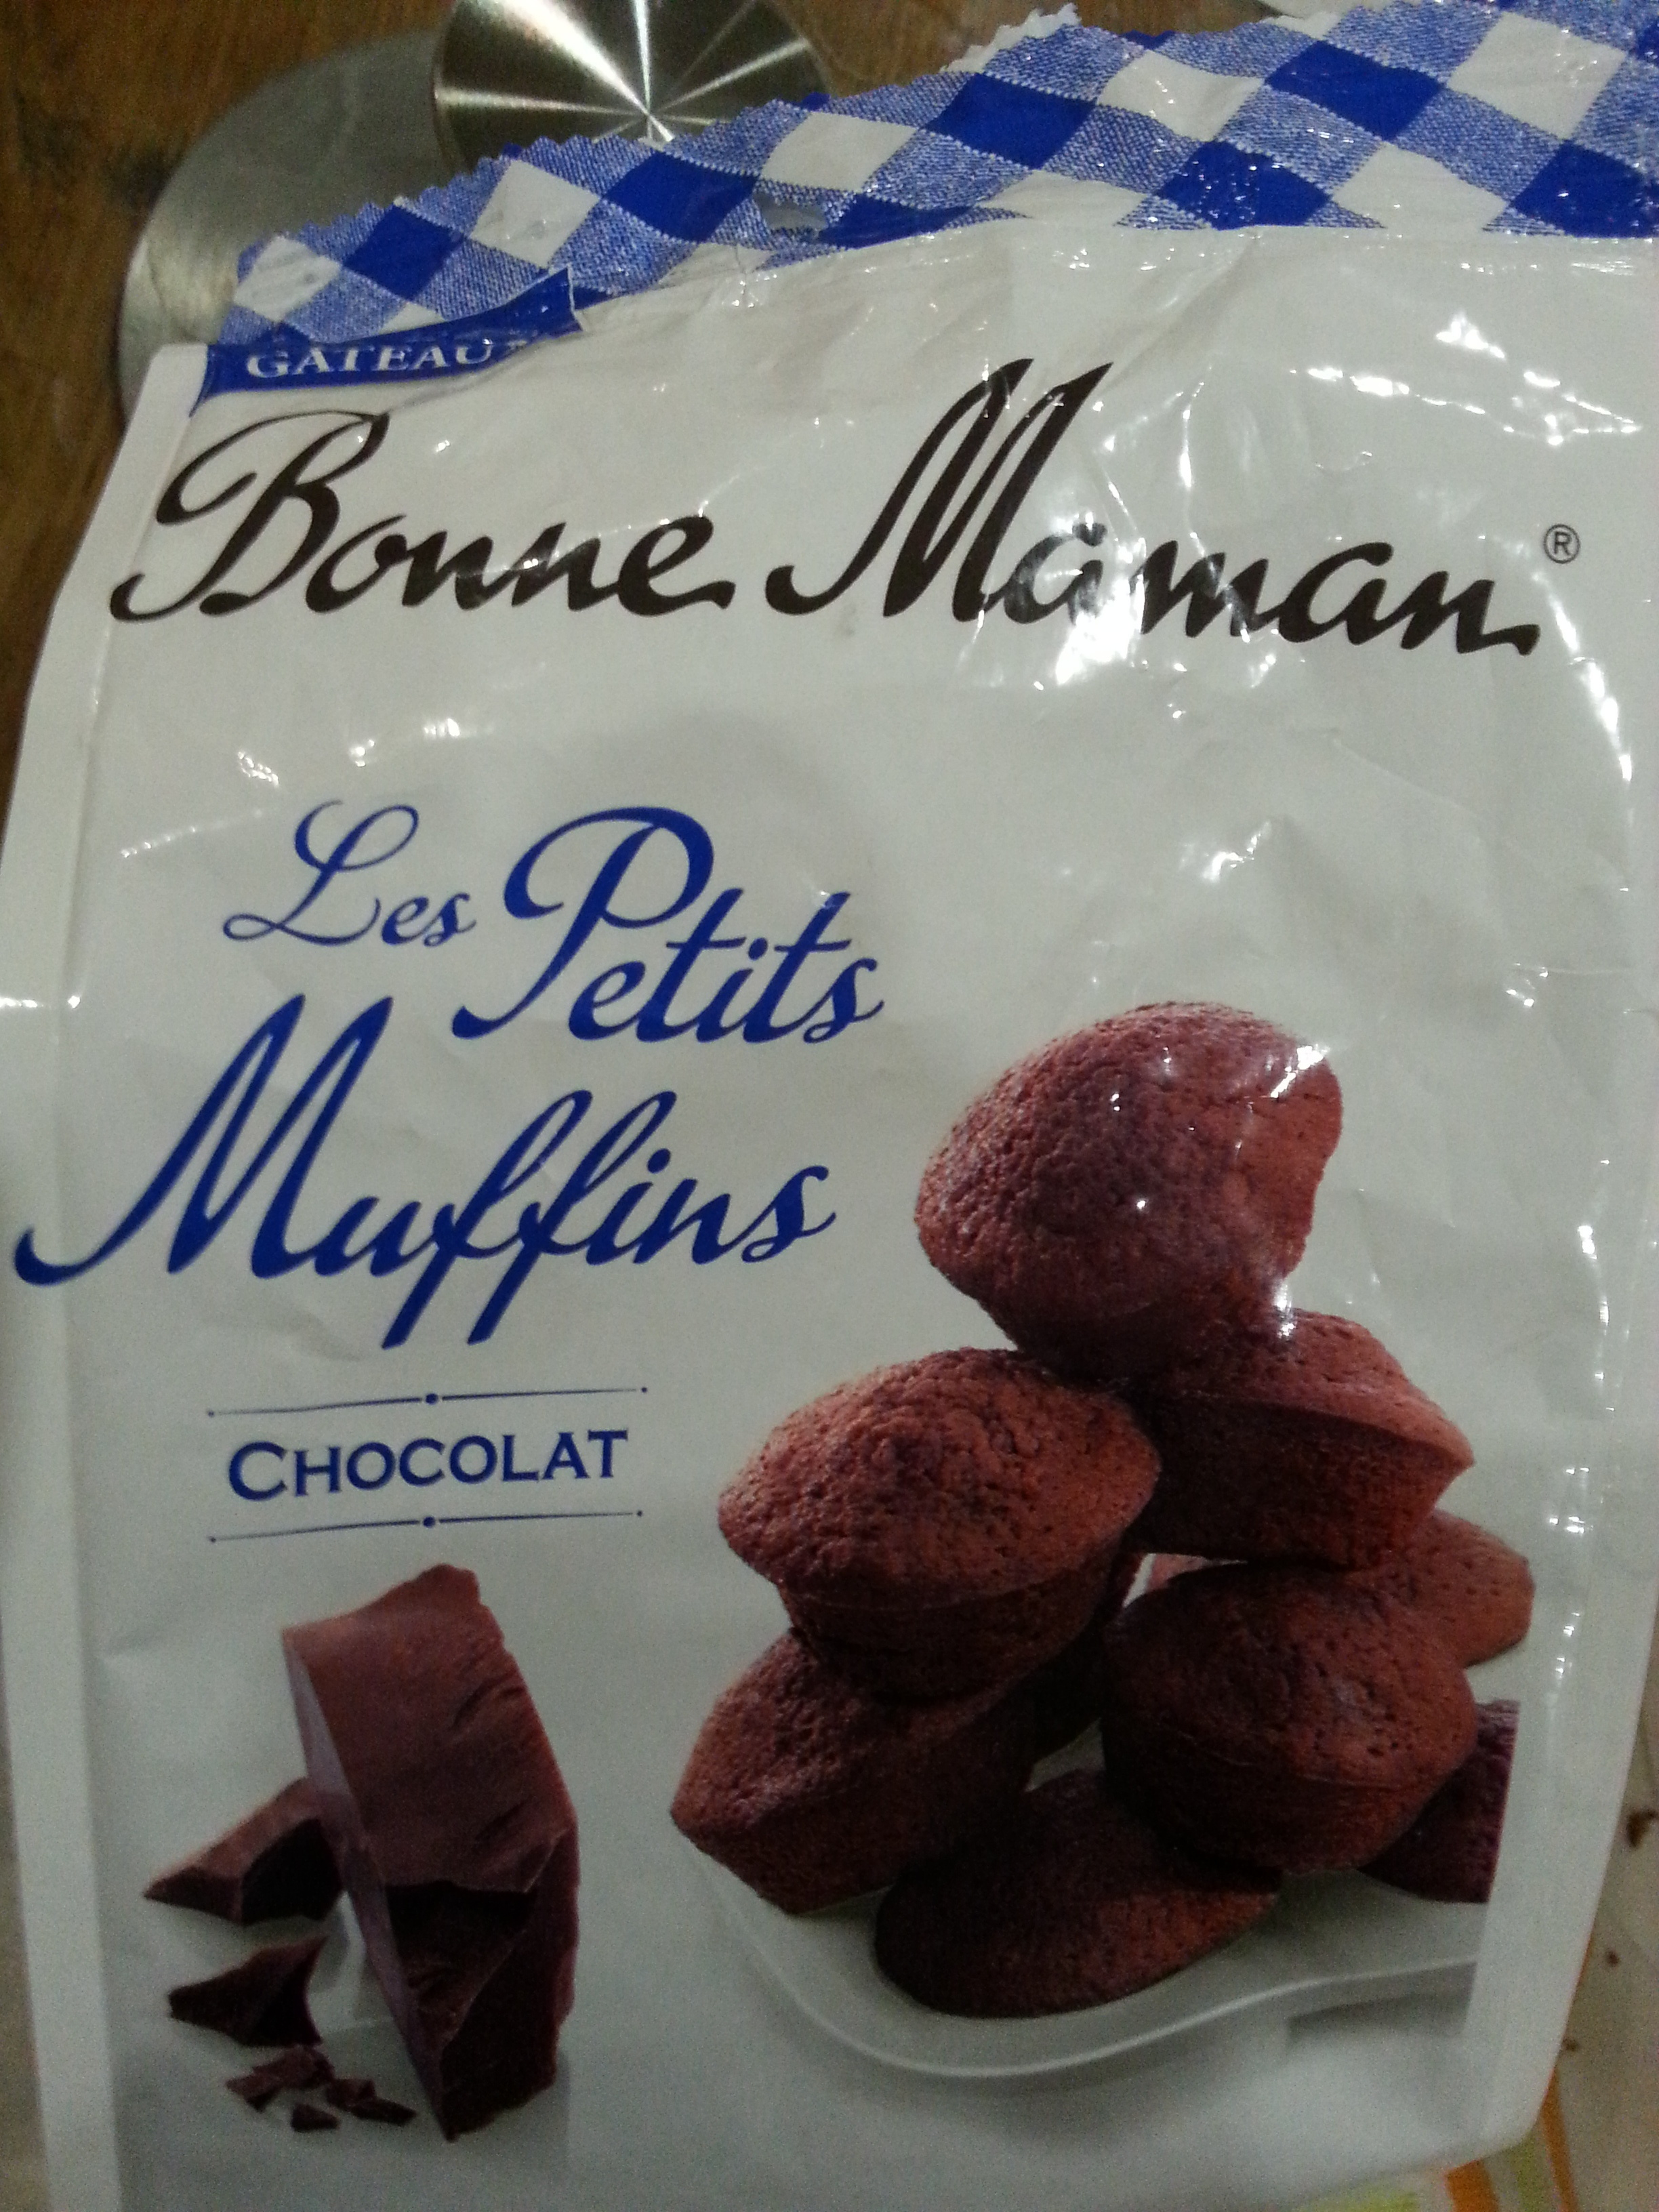 Les Petits Muffins chocolat - Product